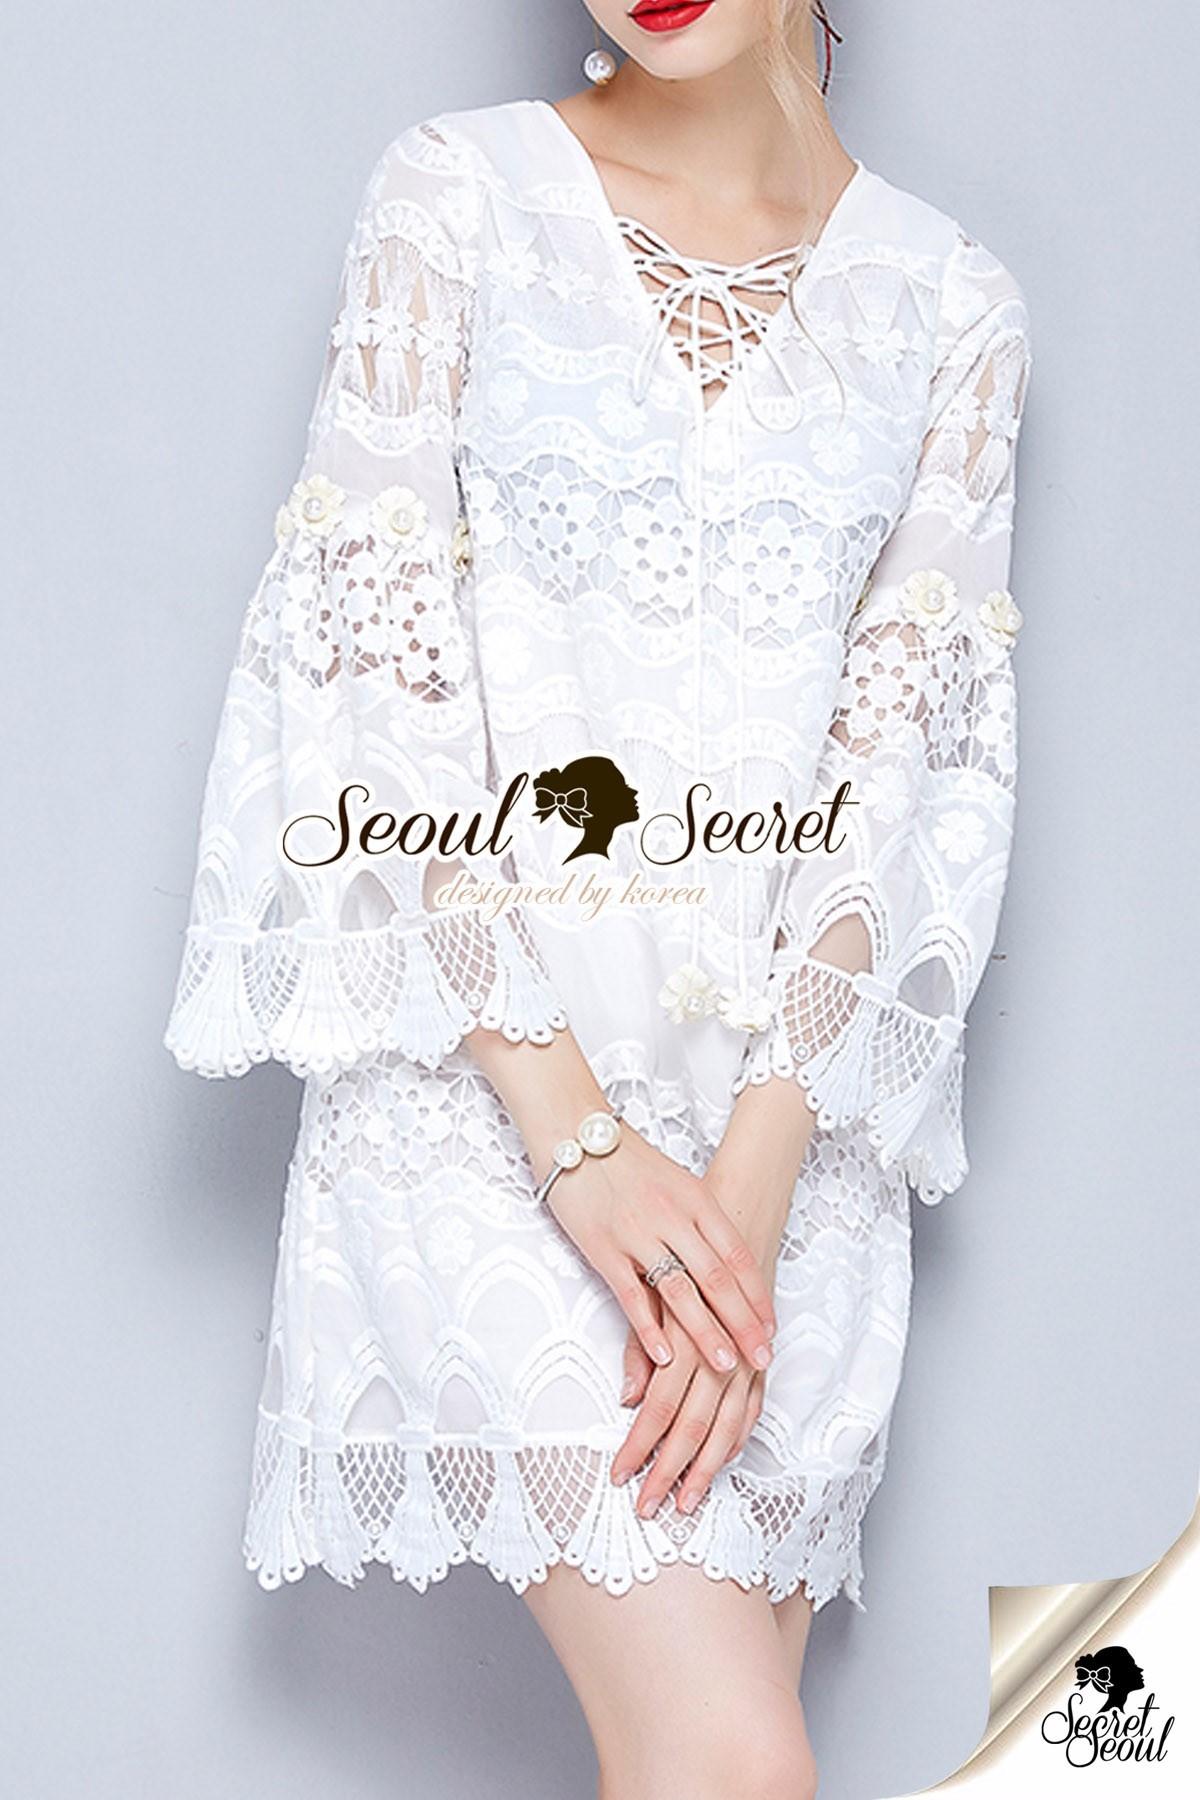 Seoul Secret Say's... Ivory Bohe Roppy Dress